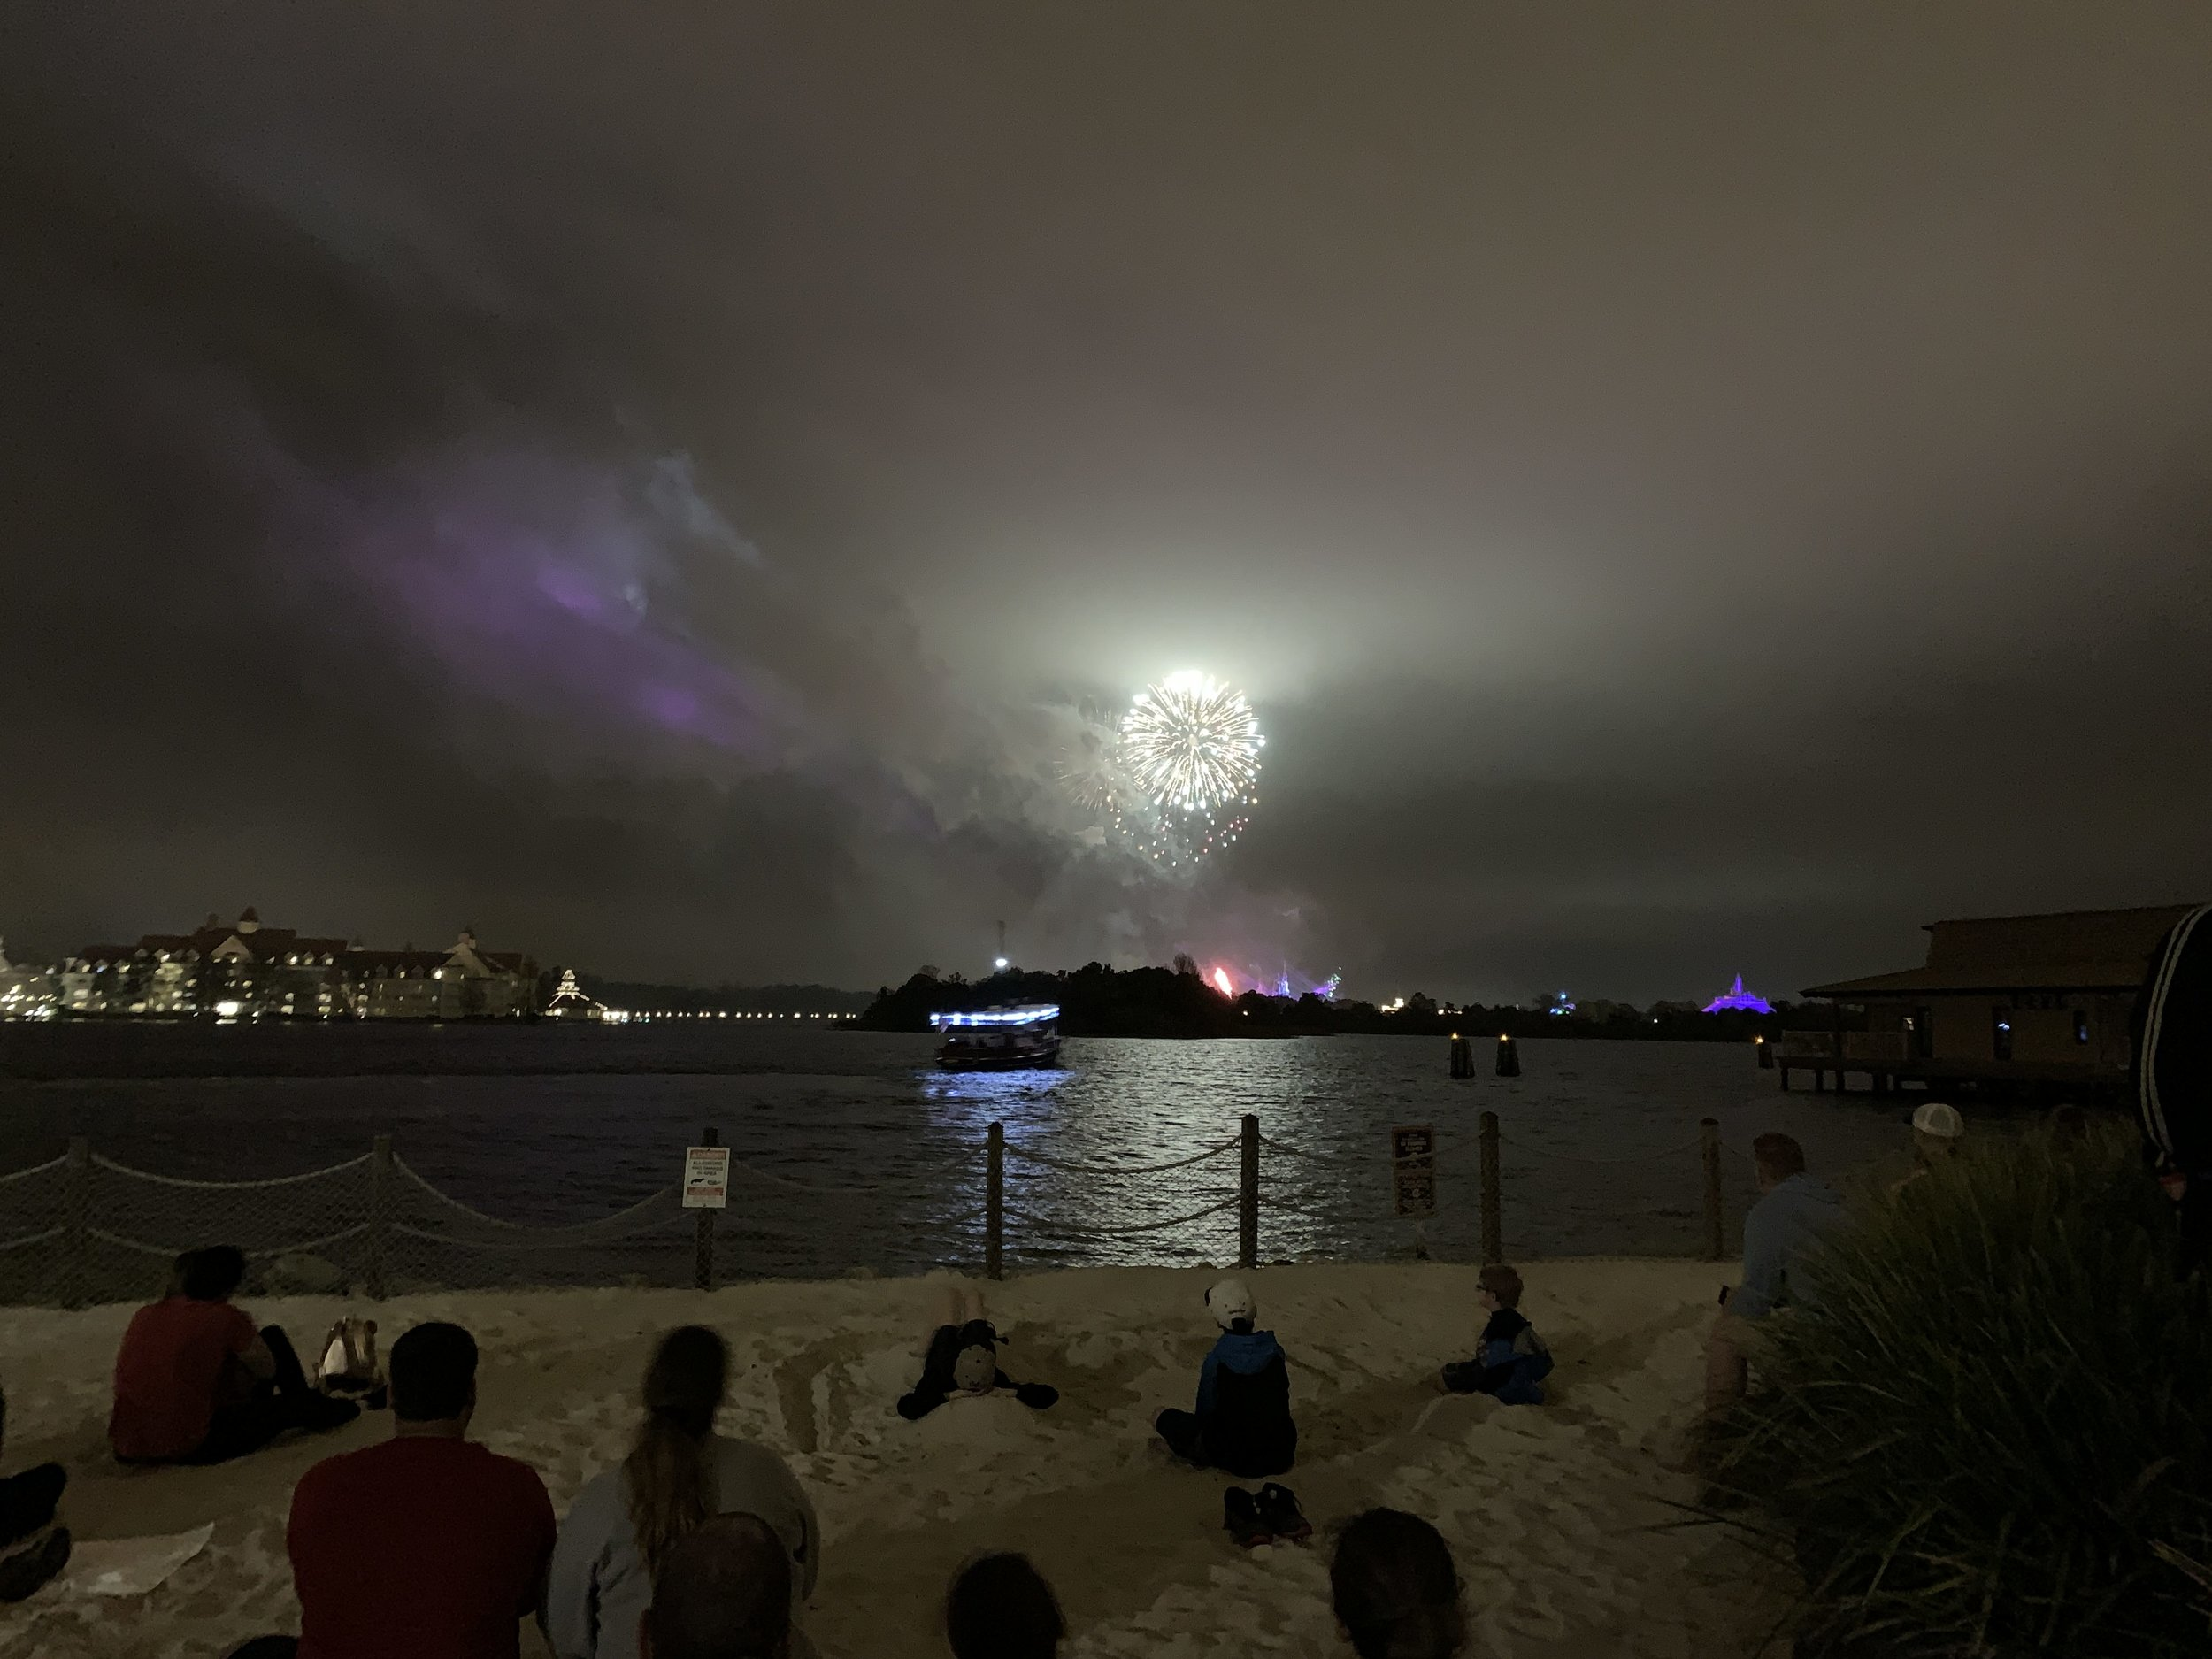 Magic Kingdom Fireworks from the Polynesian Resort's Beach